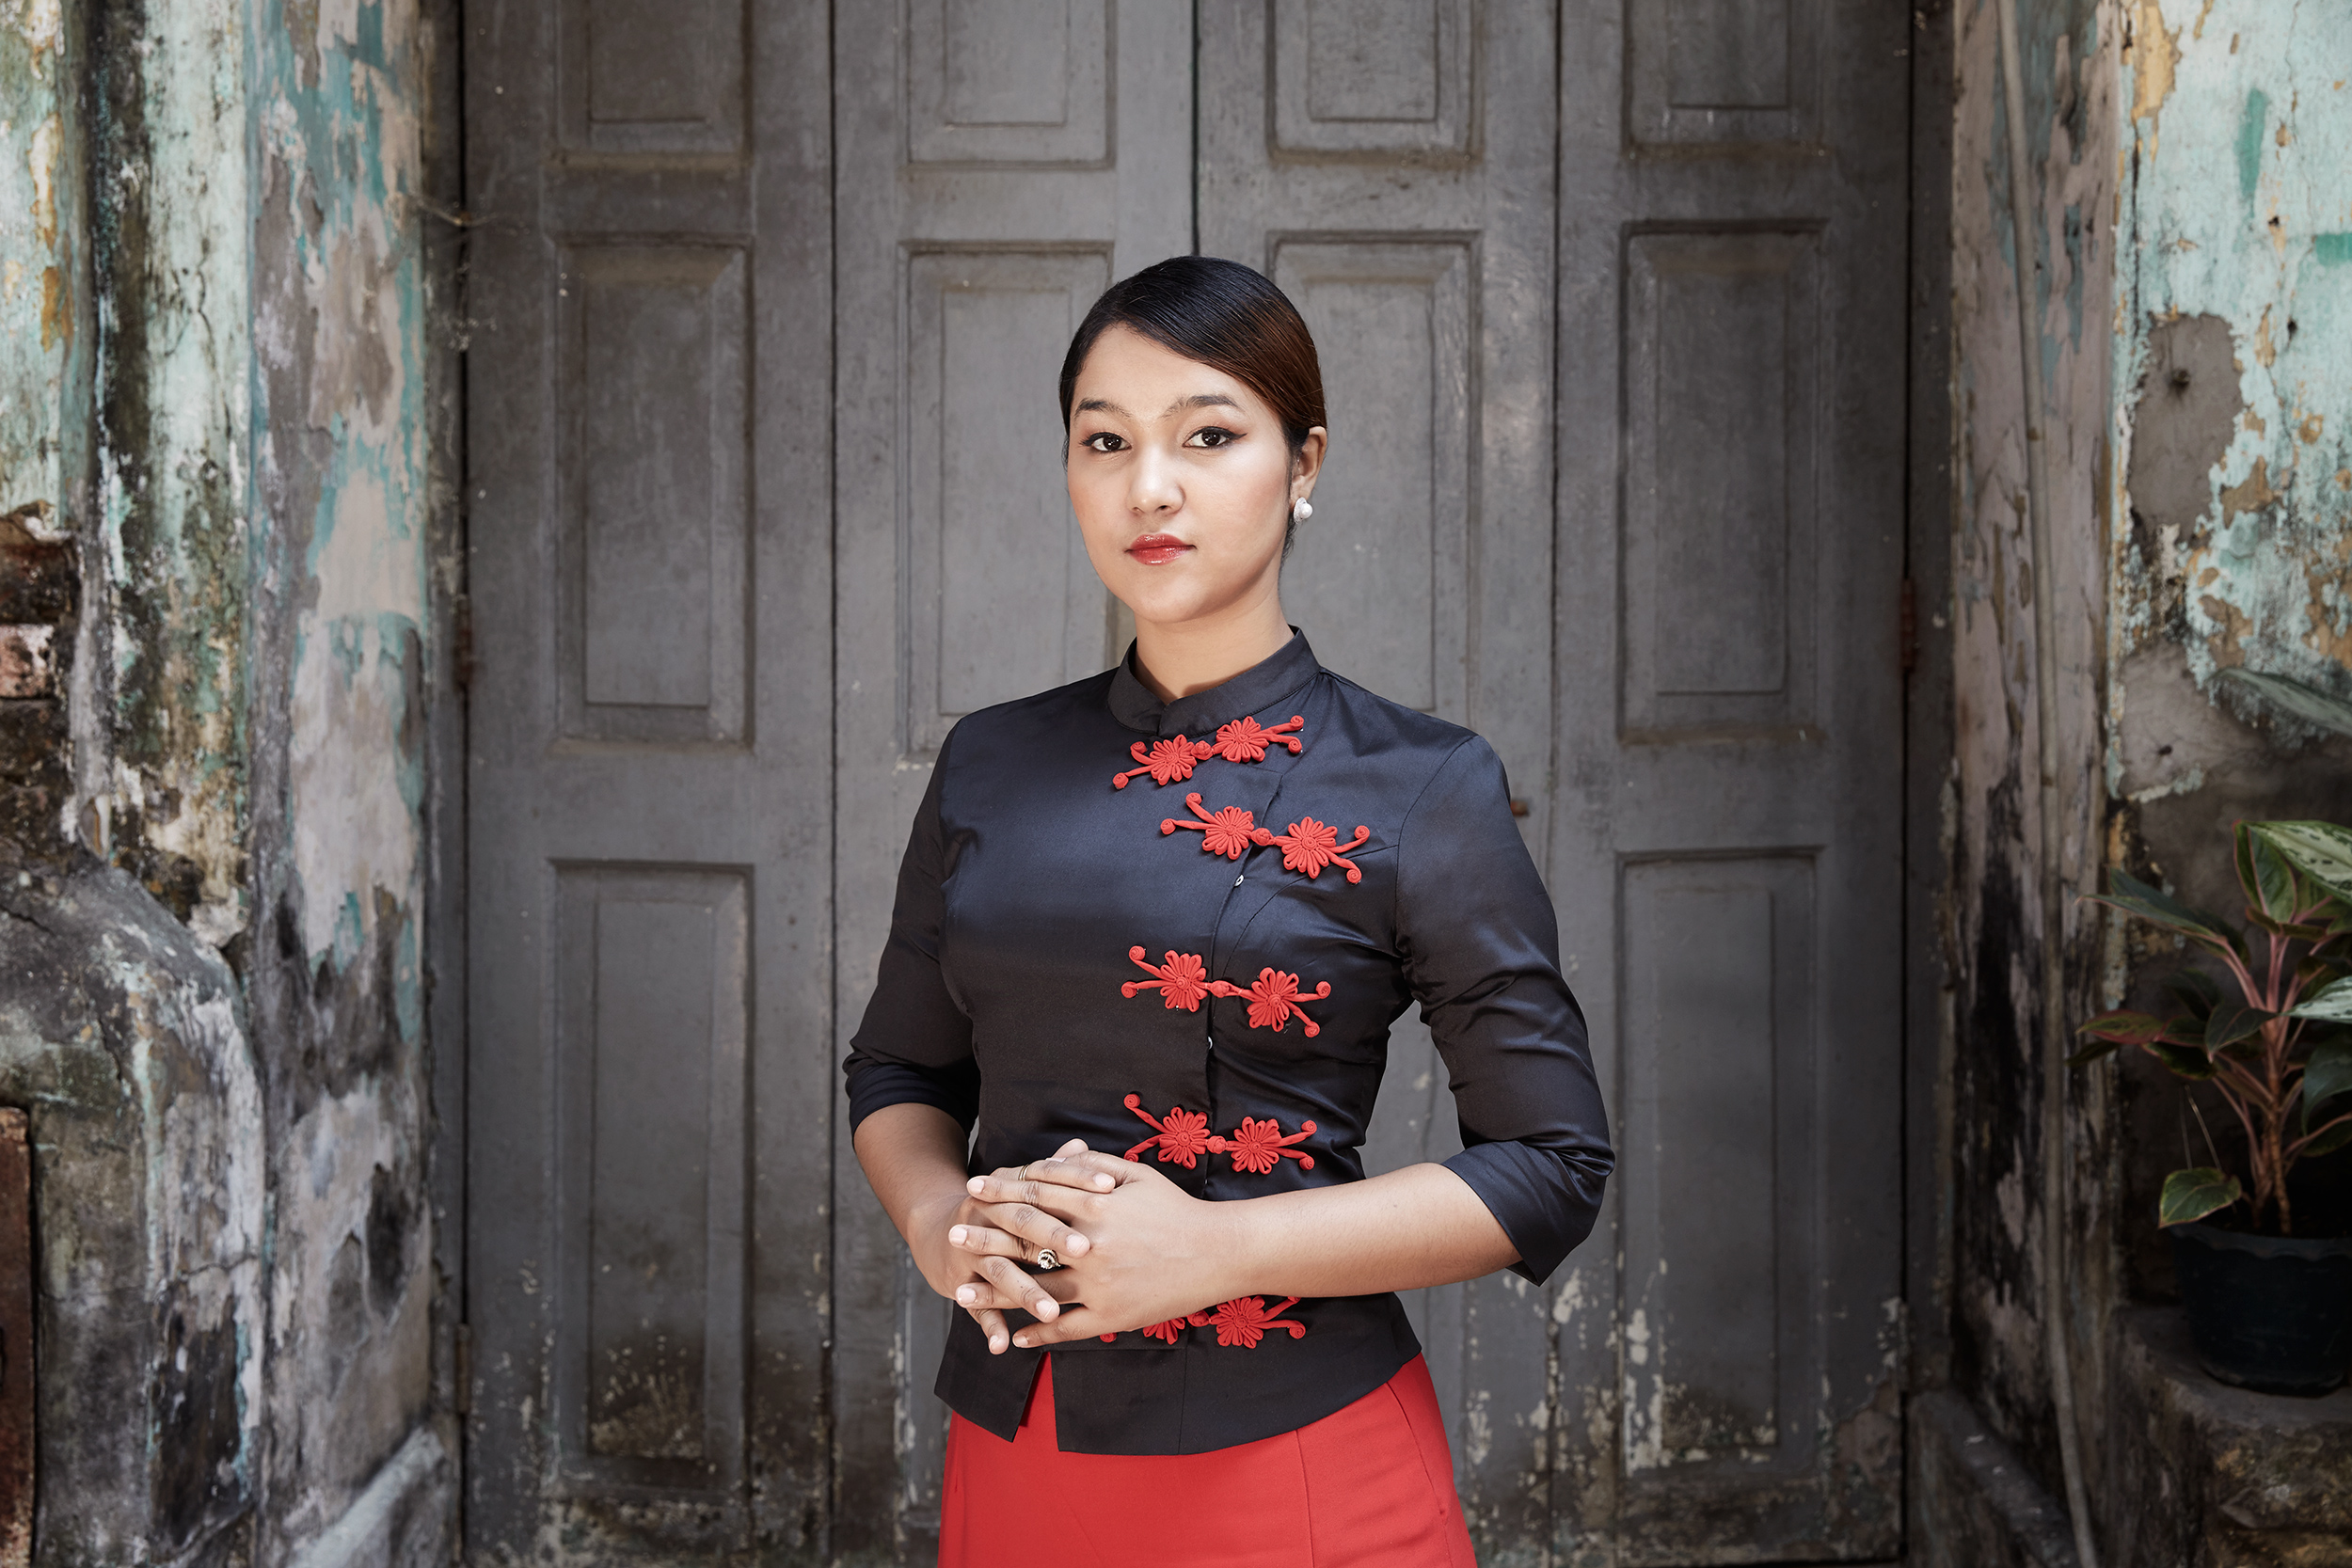 Wai Wai Nu photographed in Yangon, Myanmar on Feb. 13, 2017.